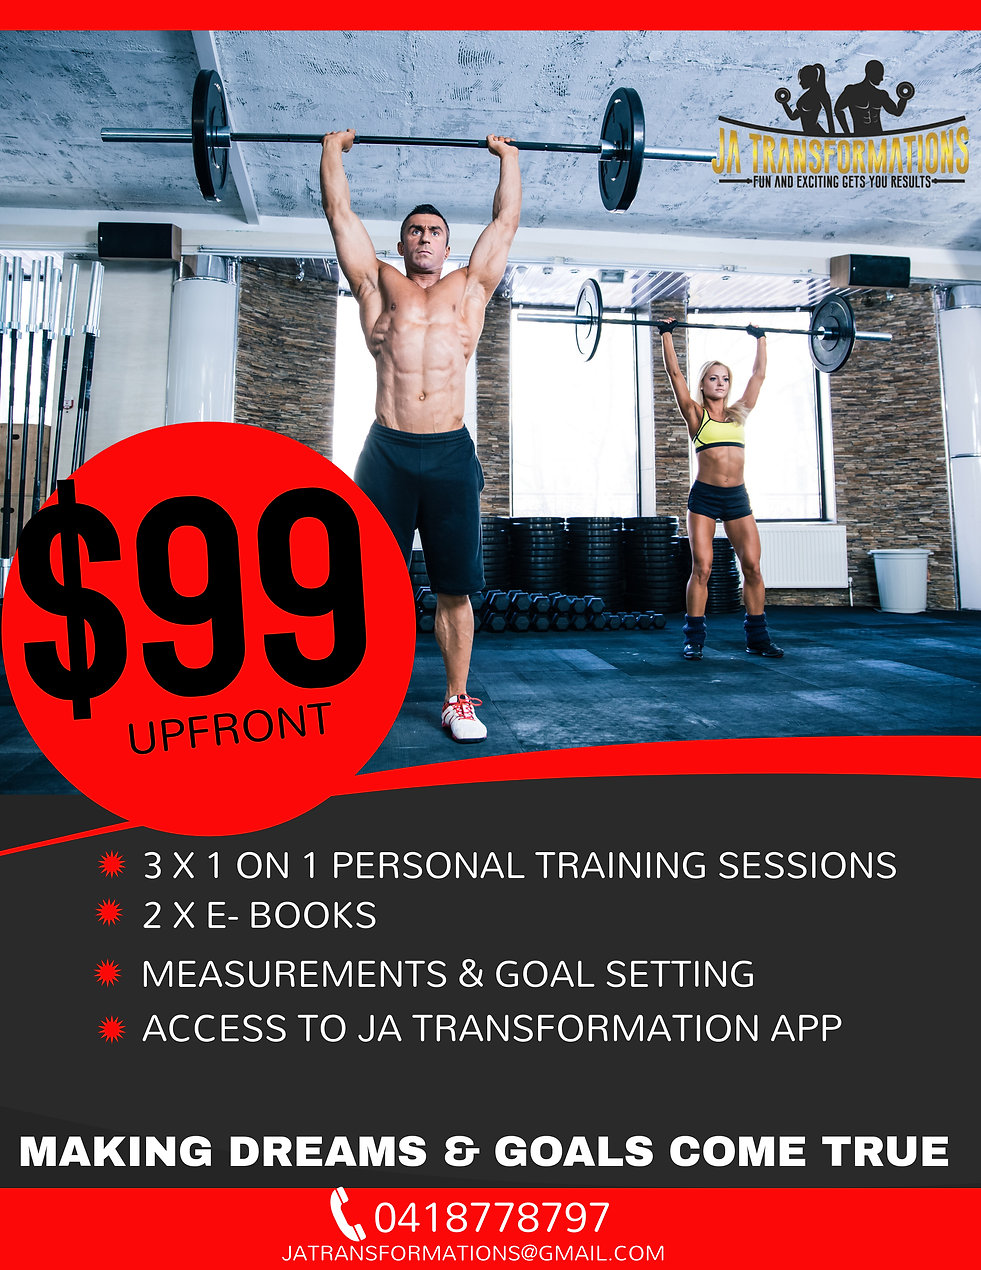 Copy of gym flyer (1).jpg